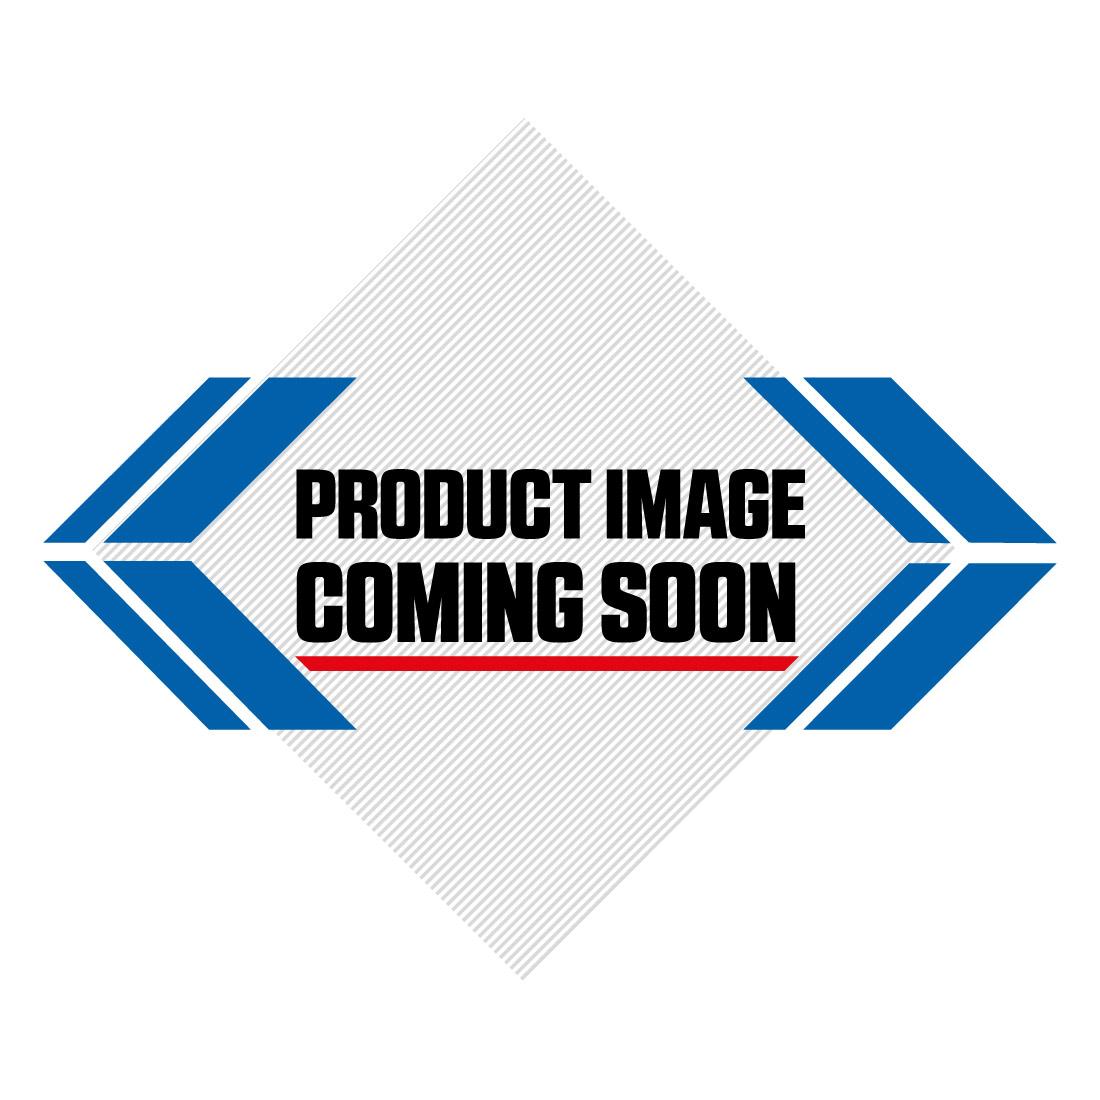 Kawasaki Restyled Plastic Kit KX 85 (01-09) (11-12) OEM Factory Image-3